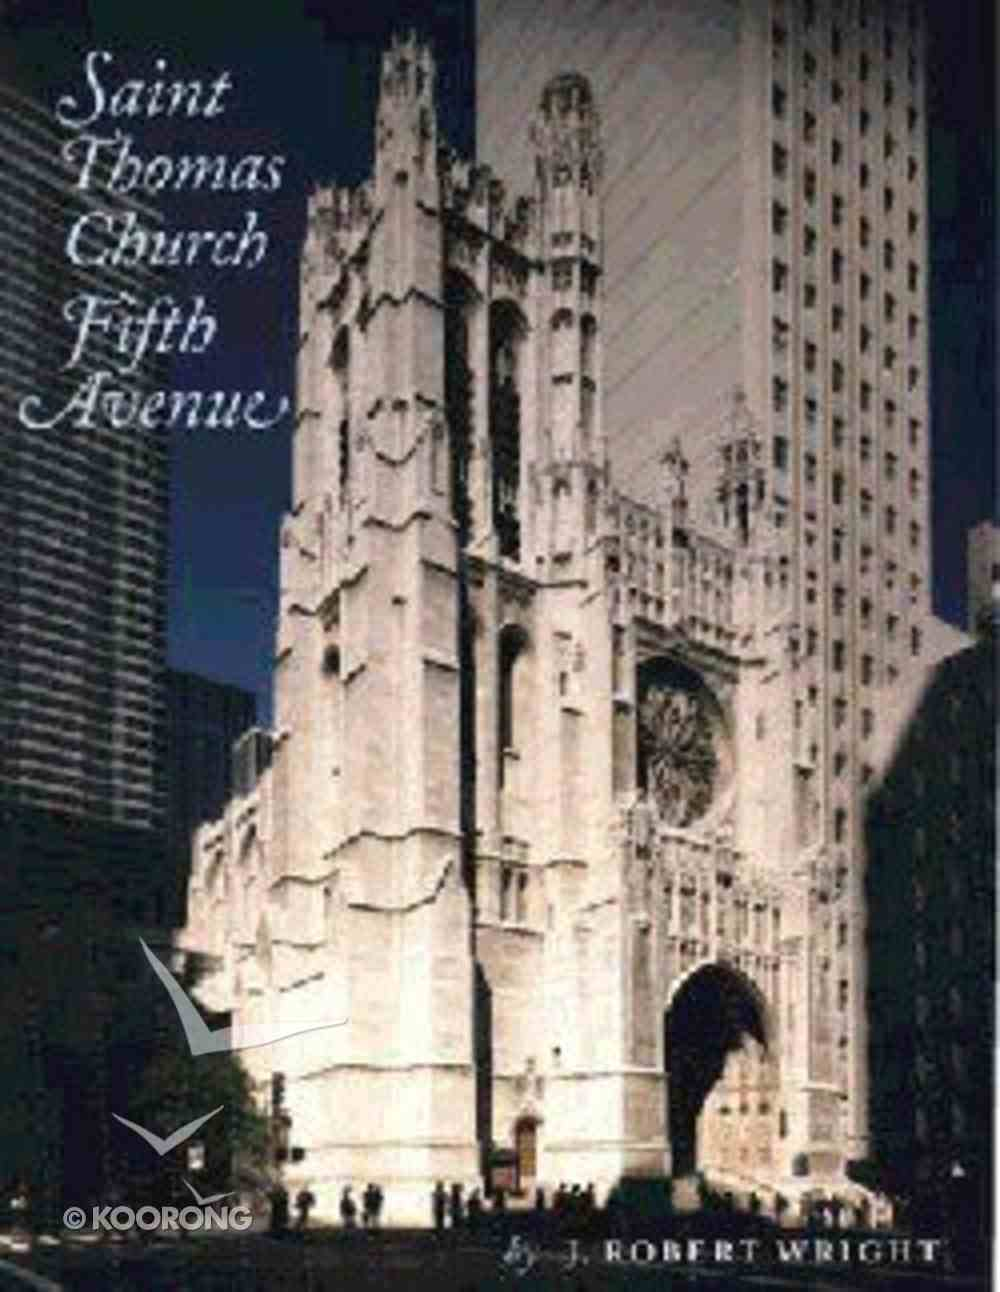 Saint Thomas Church Fifth Avenue Hardback